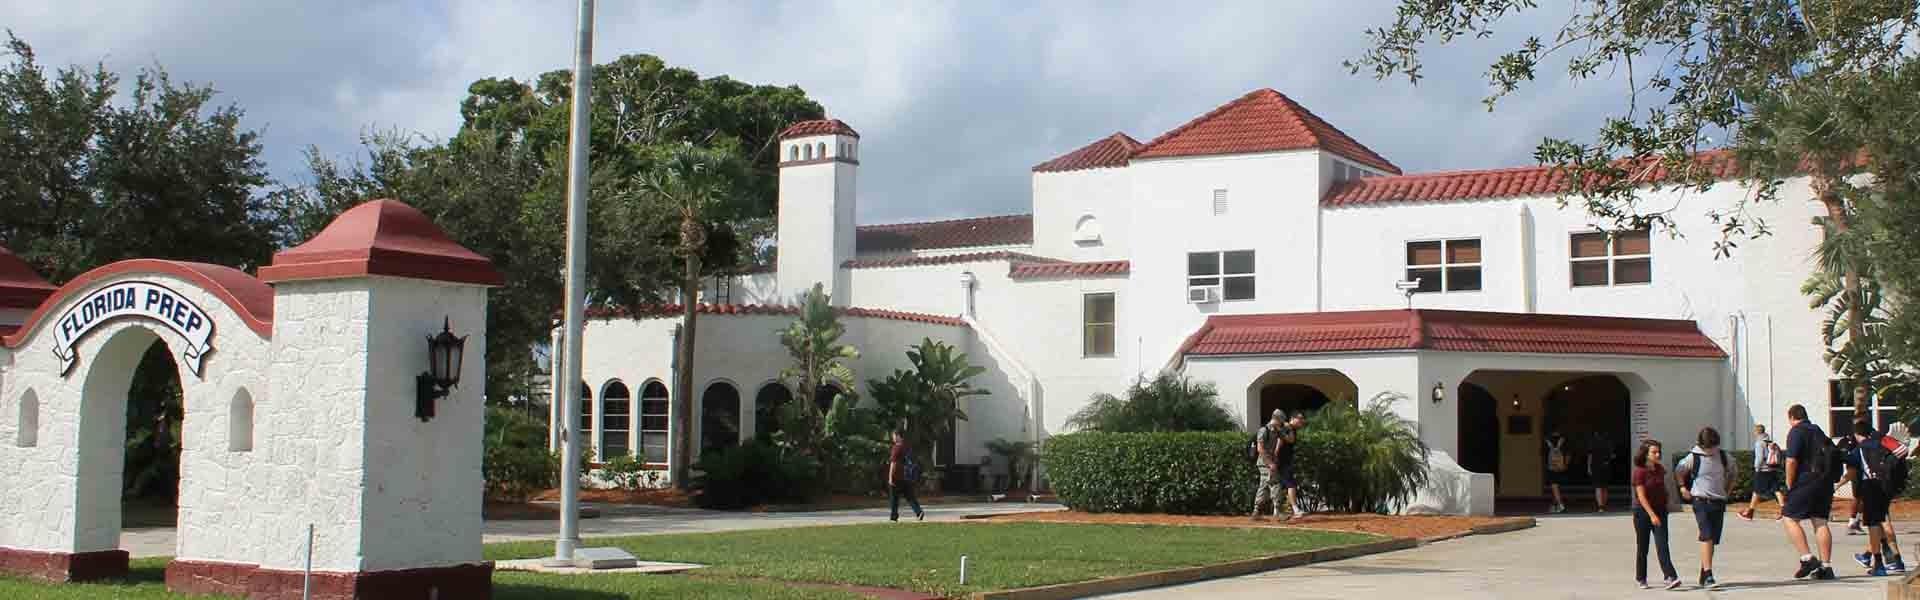 FloridaPreparatoryAcademy-Highschool-Florida-School-MAin-Banner-2019